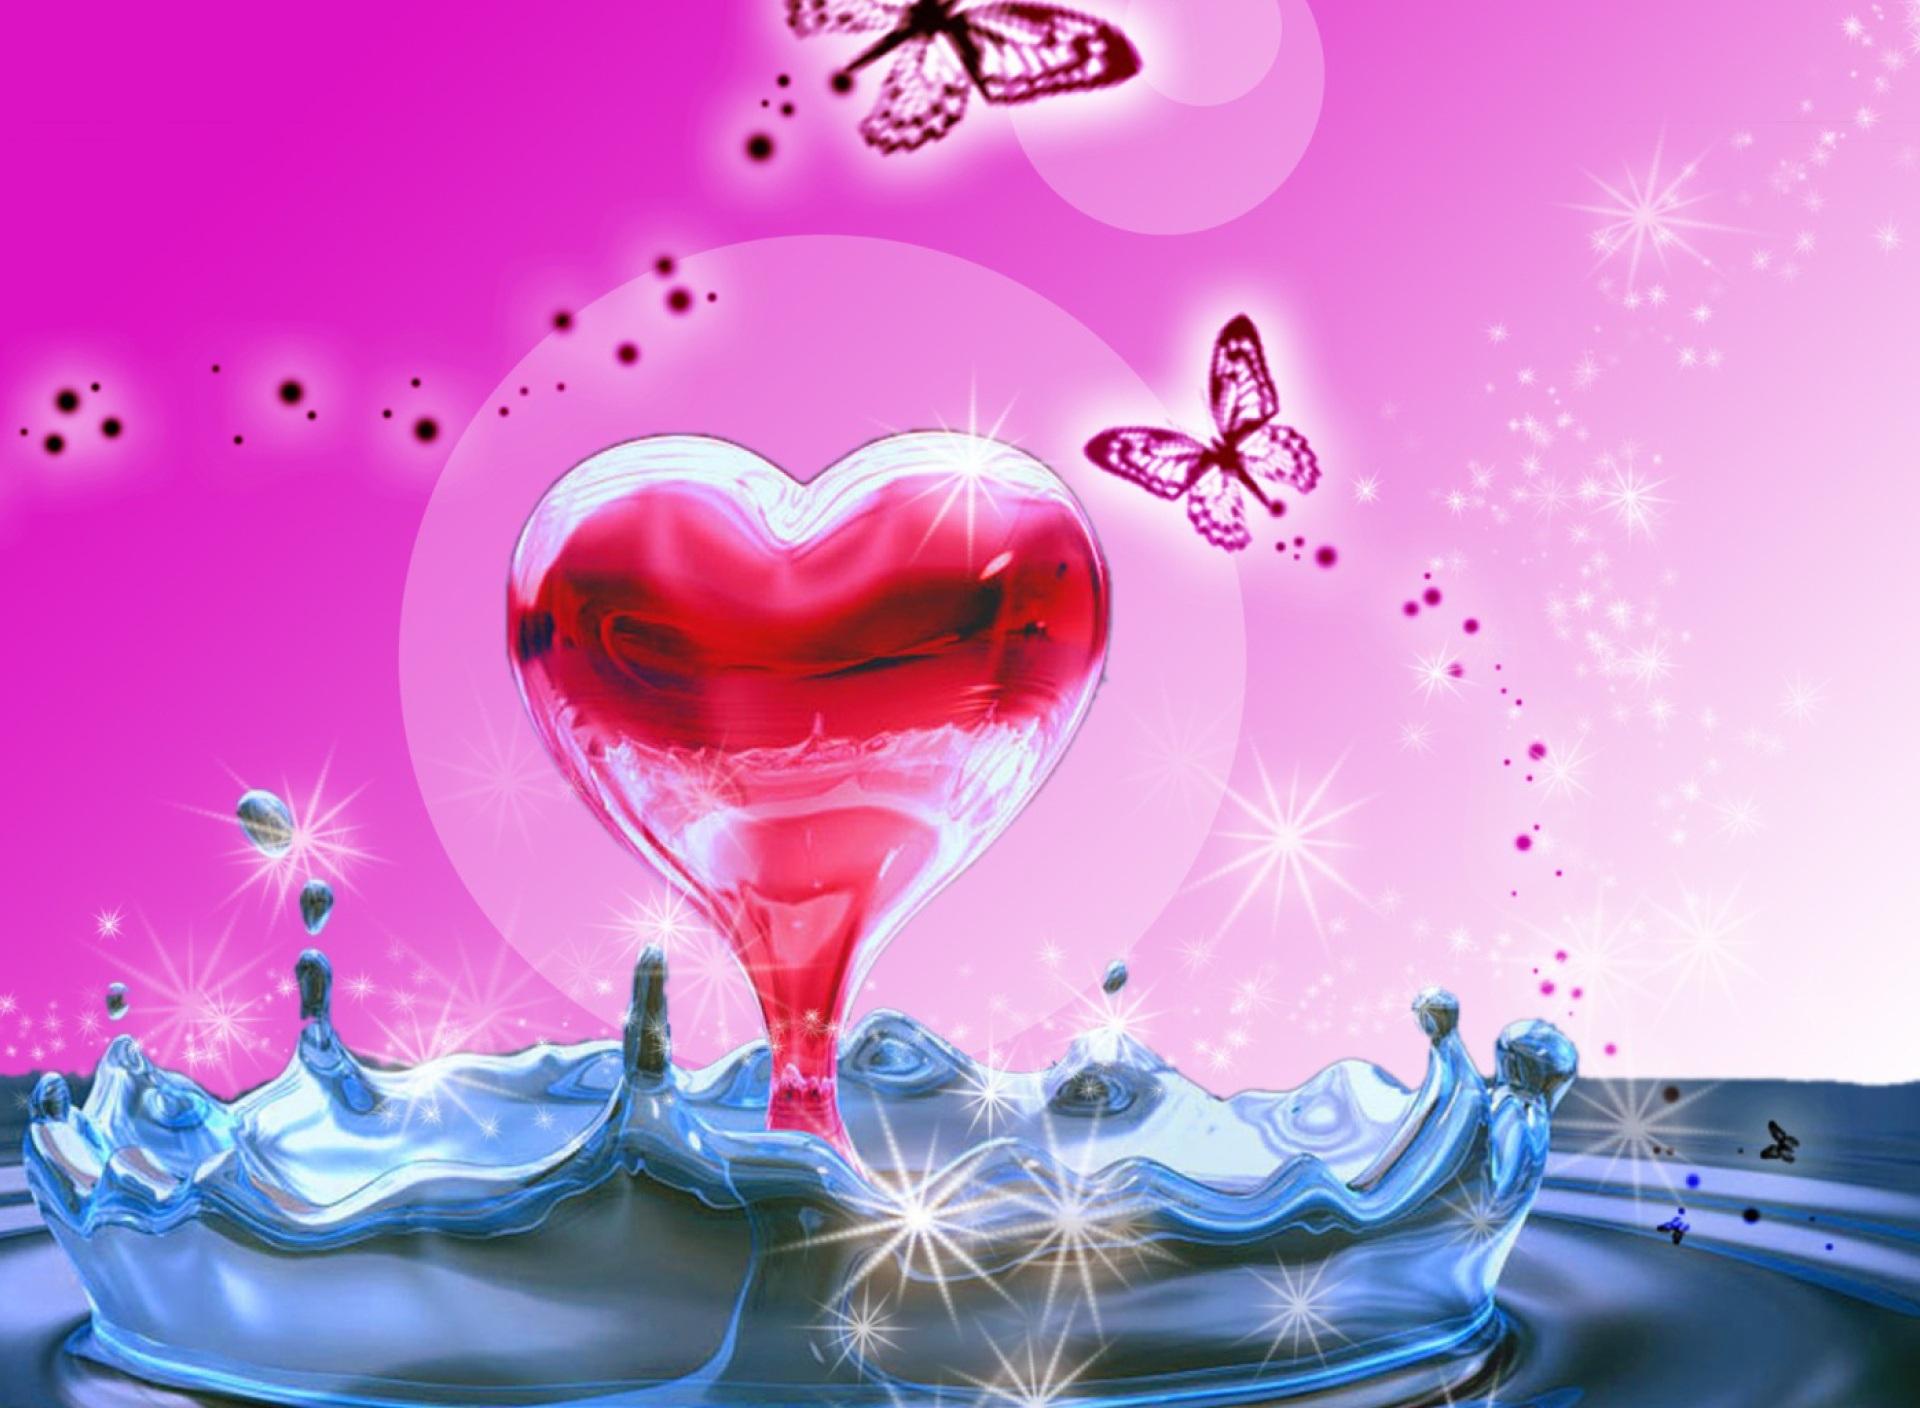 3D Heart In Water 1920x1408 wallpaper1920X1408 wallpaper screensaver 1920x1408